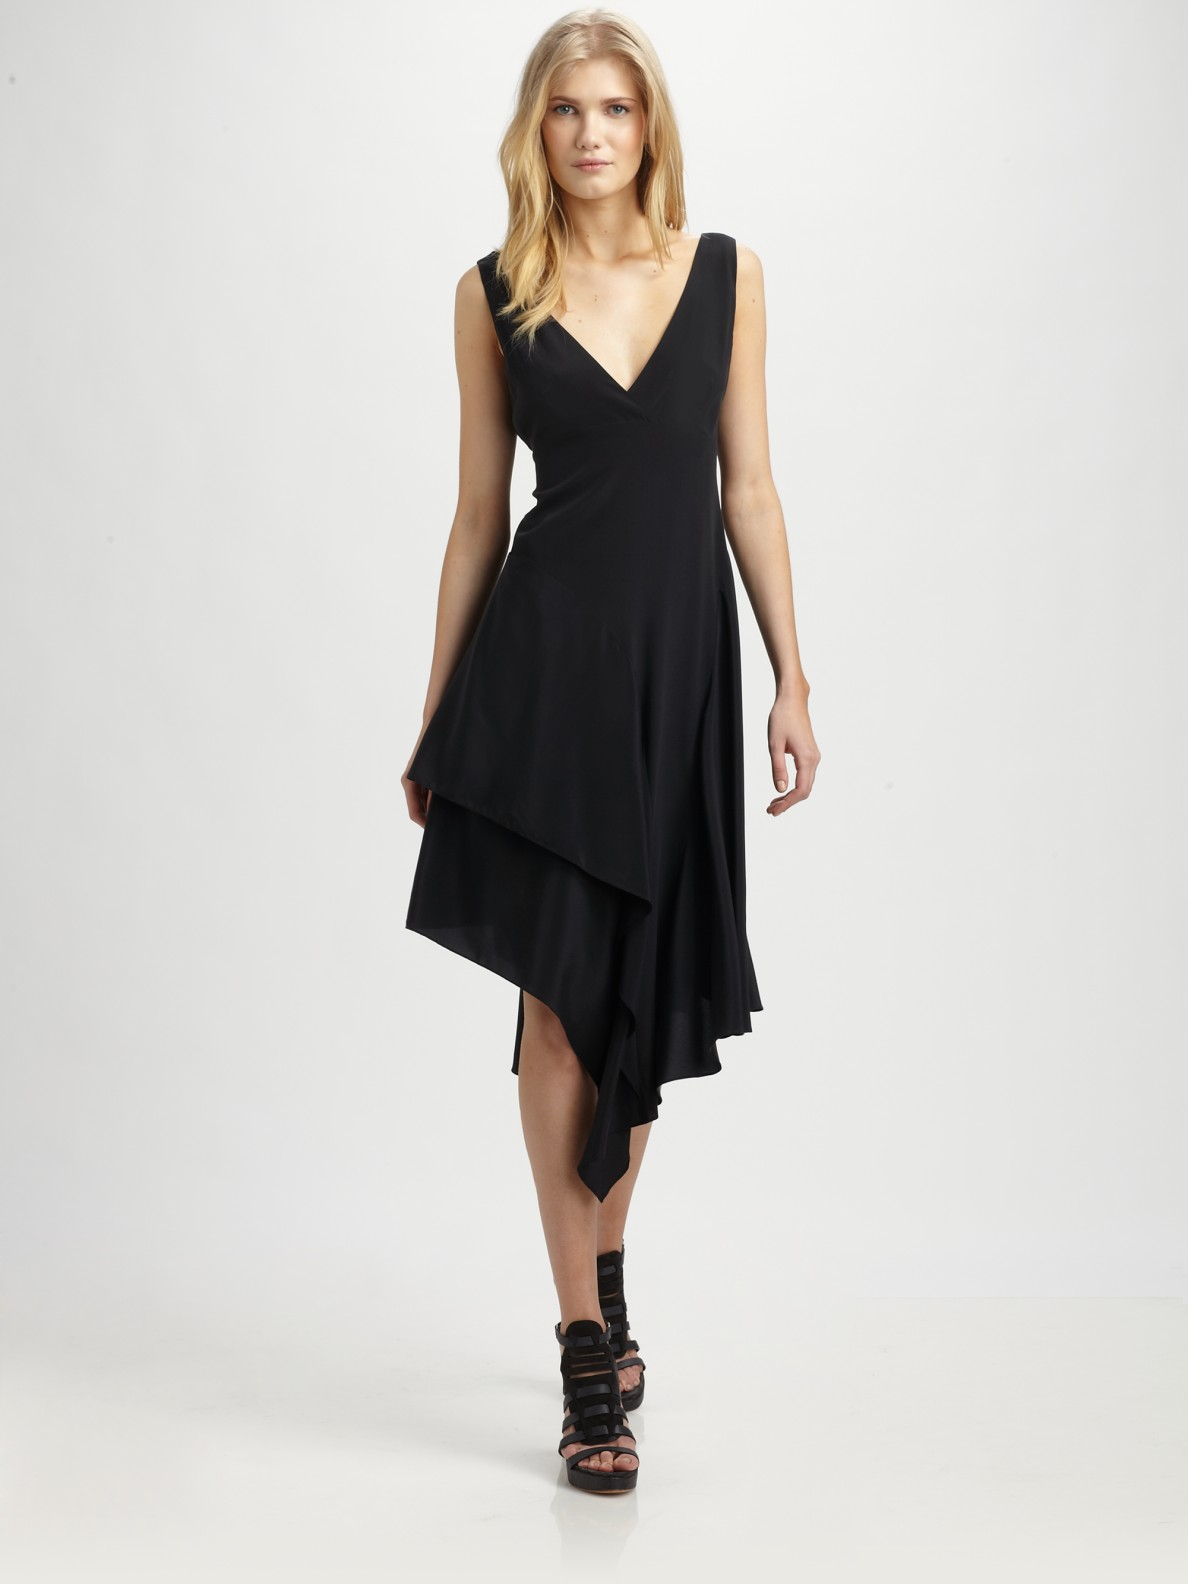 dkny asymmetrical crepe de chine dress in black lyst. Black Bedroom Furniture Sets. Home Design Ideas